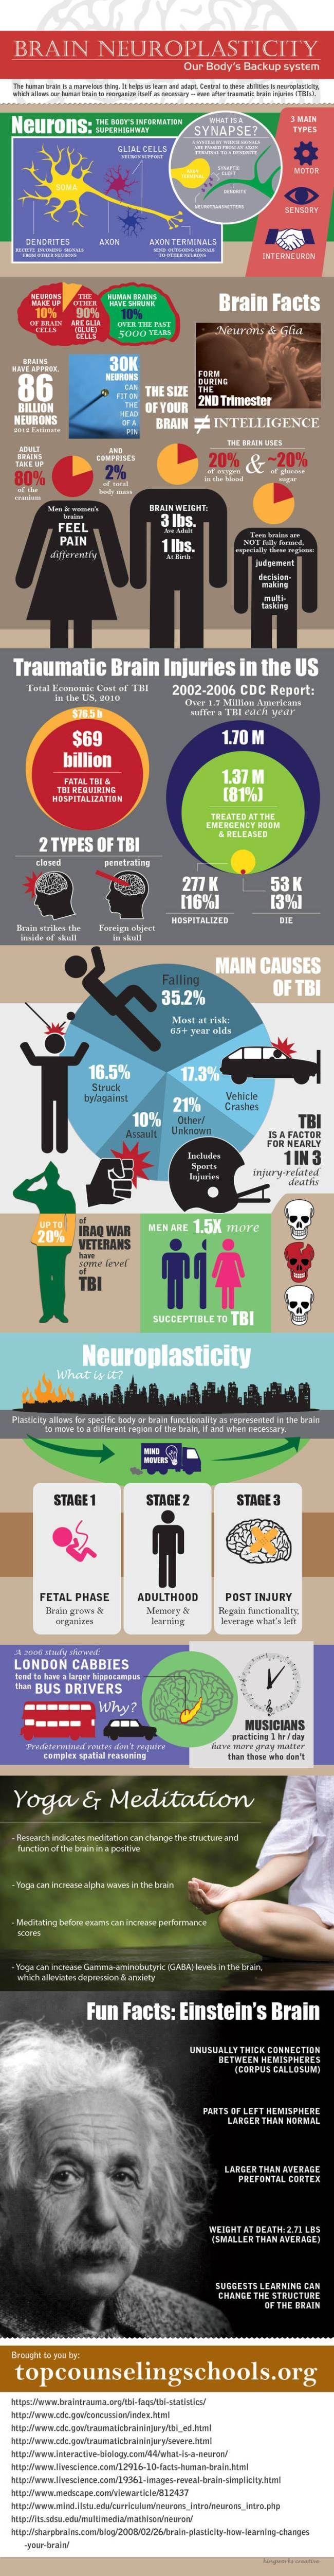 best Brain Science Memory images on Pinterest The brain